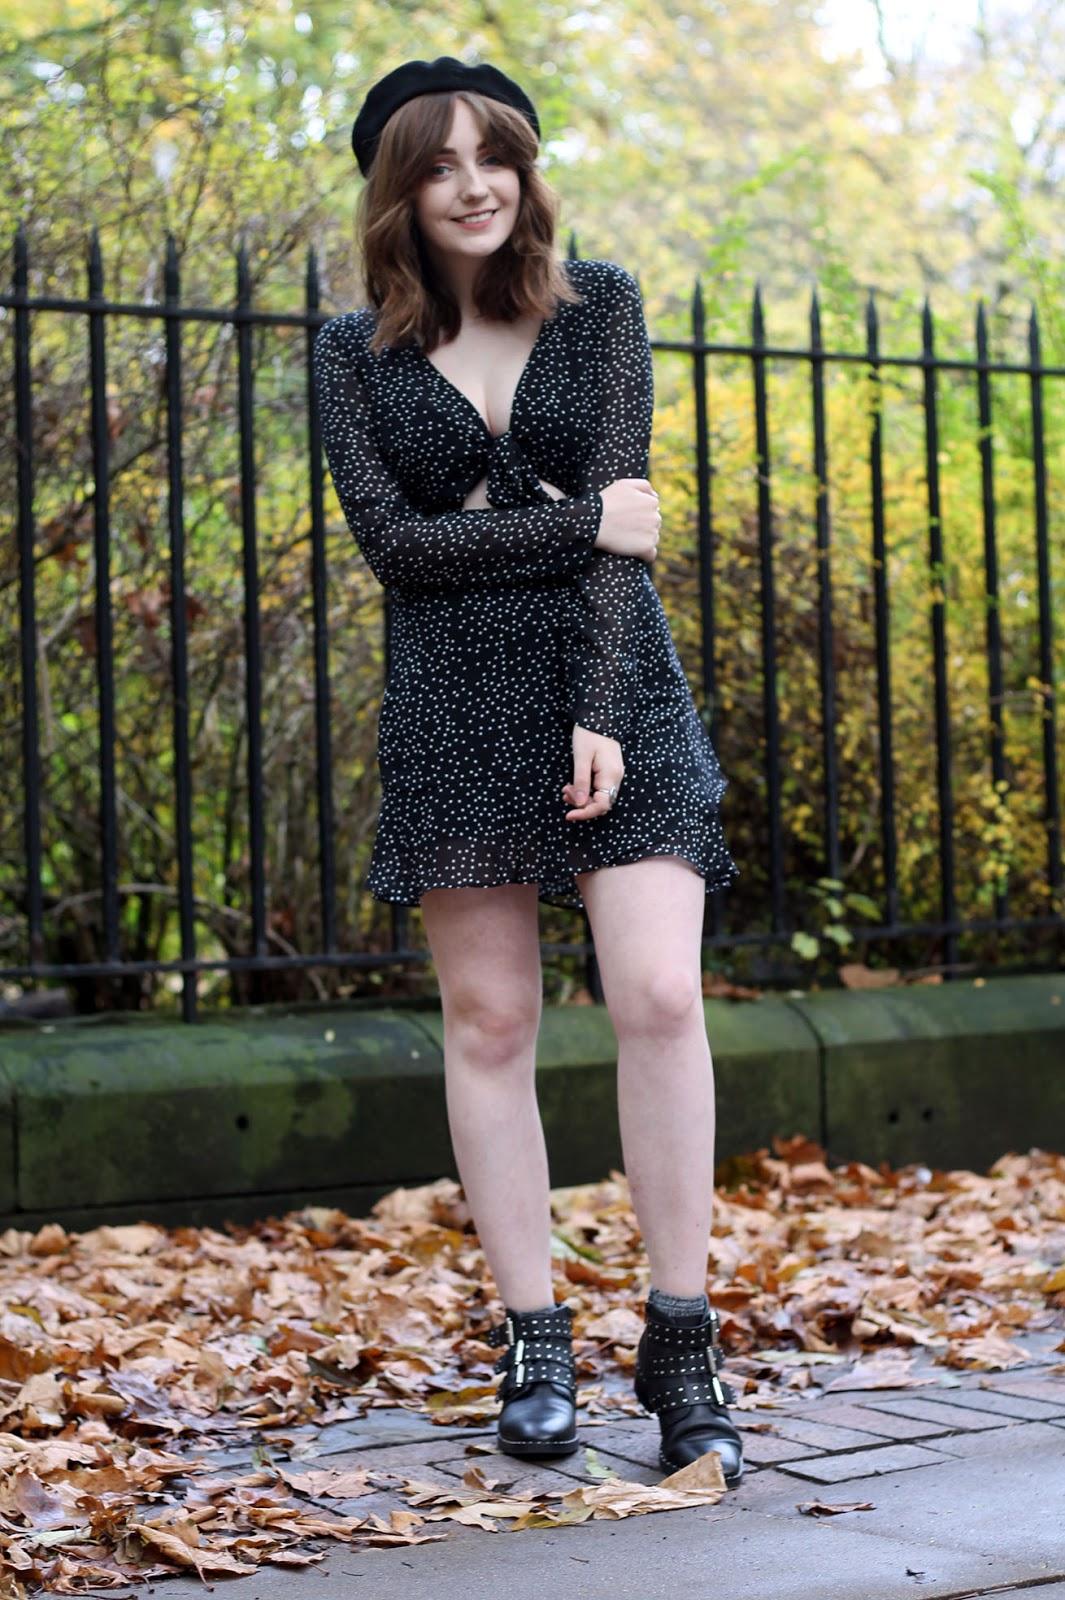 Liverpool fashion blog with Tobi bowie dress